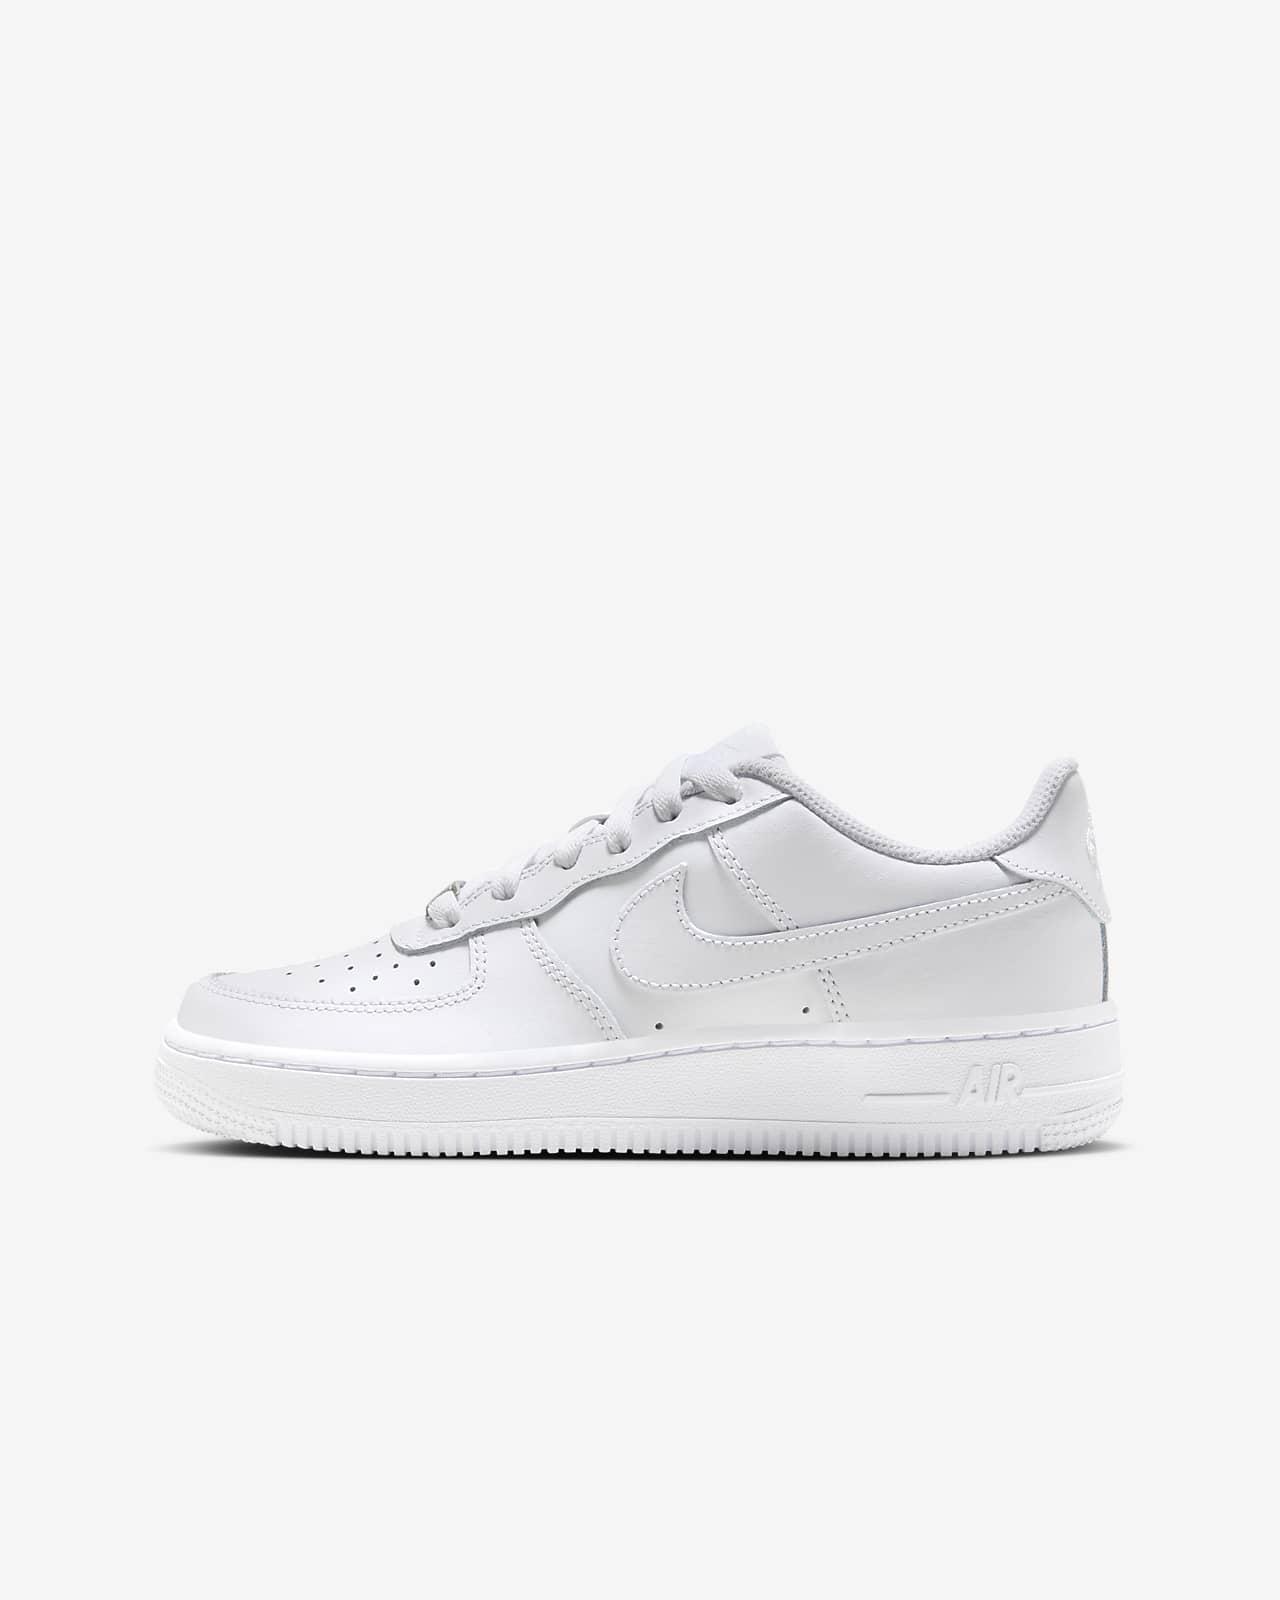 Calzado para niños talla grande Nike Air Force 1 LE